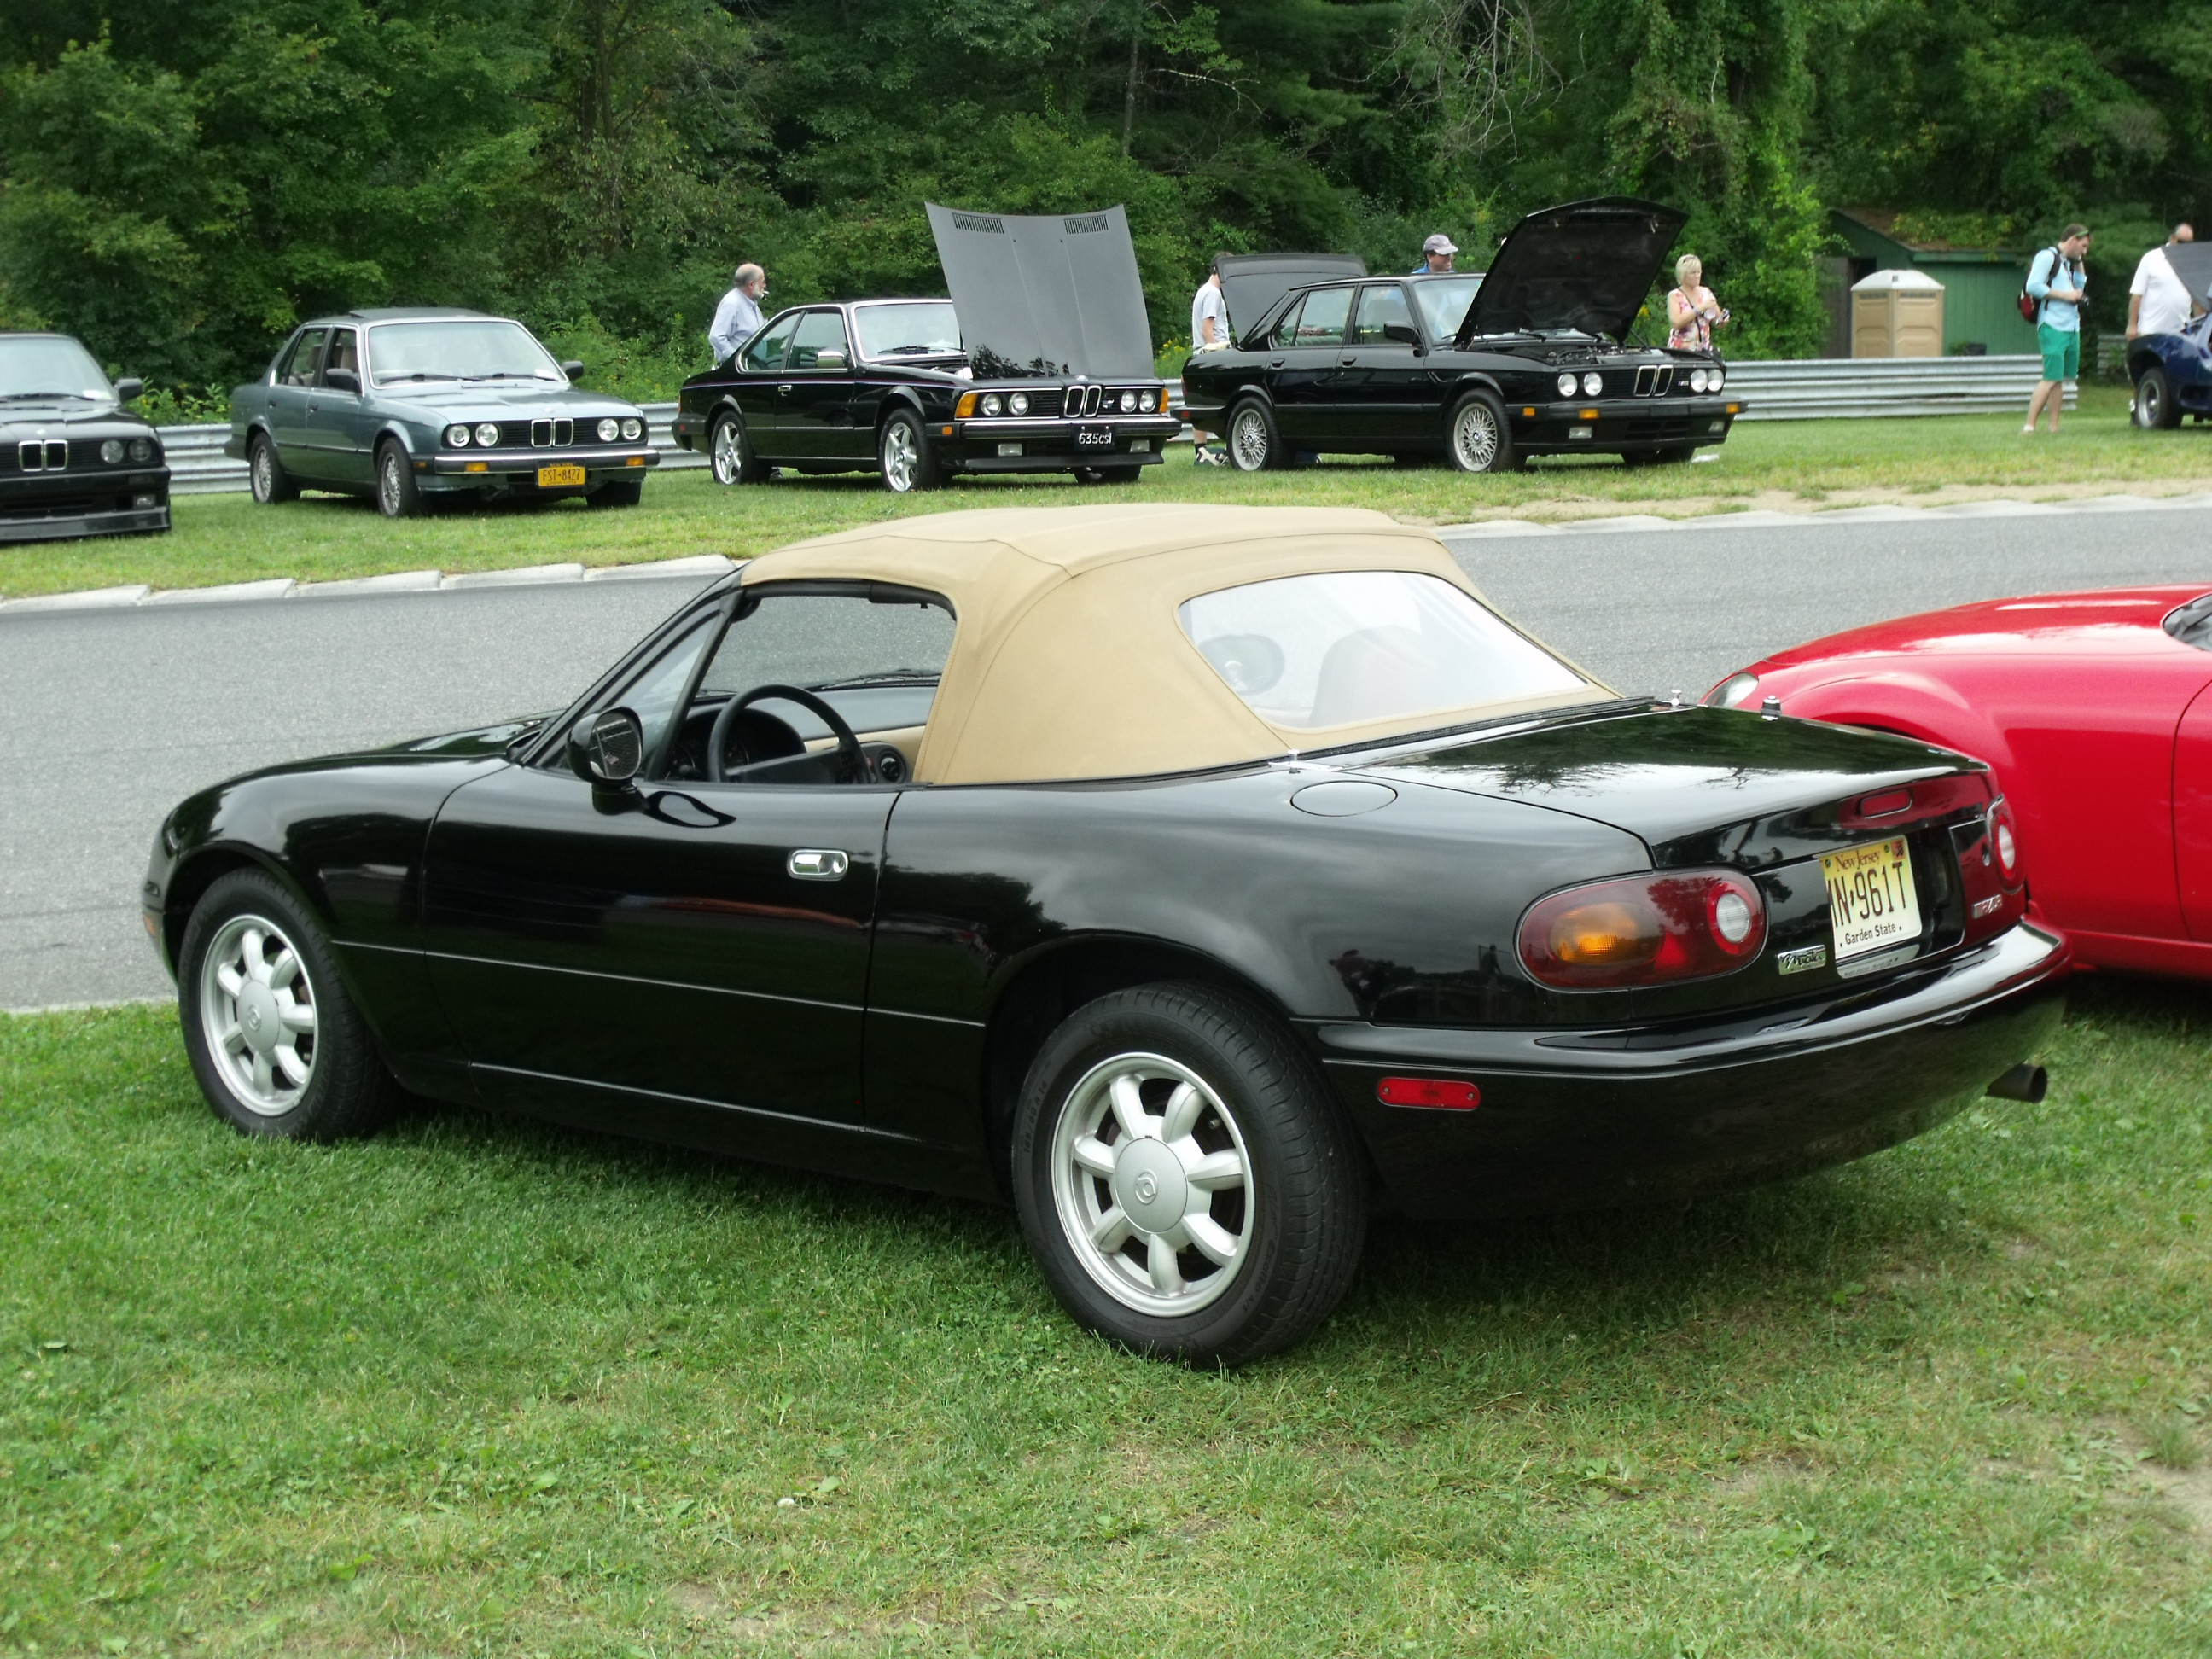 Car Headlight Bulb >> Heater Core Replacement in the '93 Mazda Miata: Part 1 ...